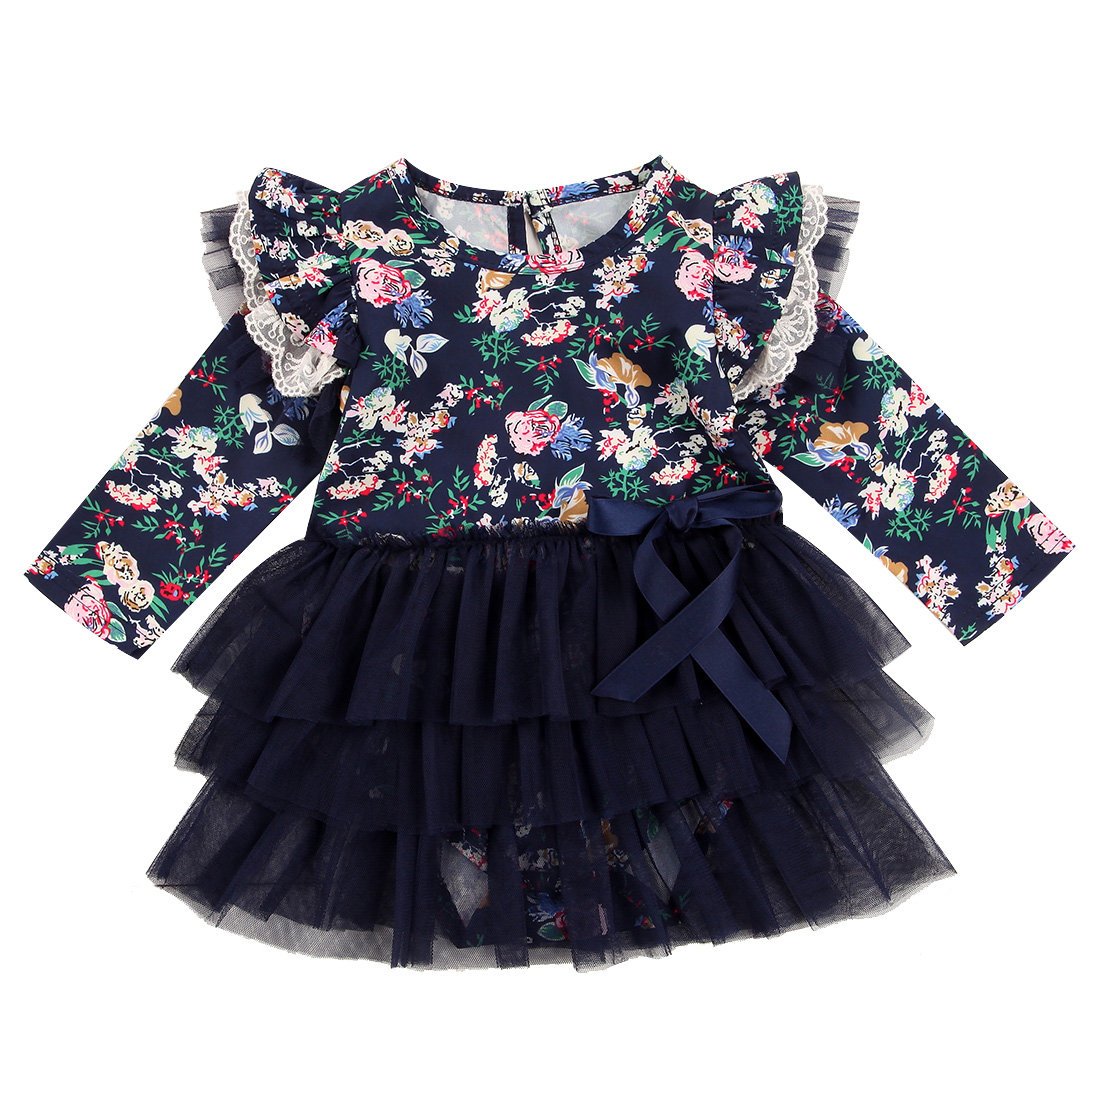 Toddler Kids Baby Girl Long Sleeve Floral Print Dress Casual Tutu Dress